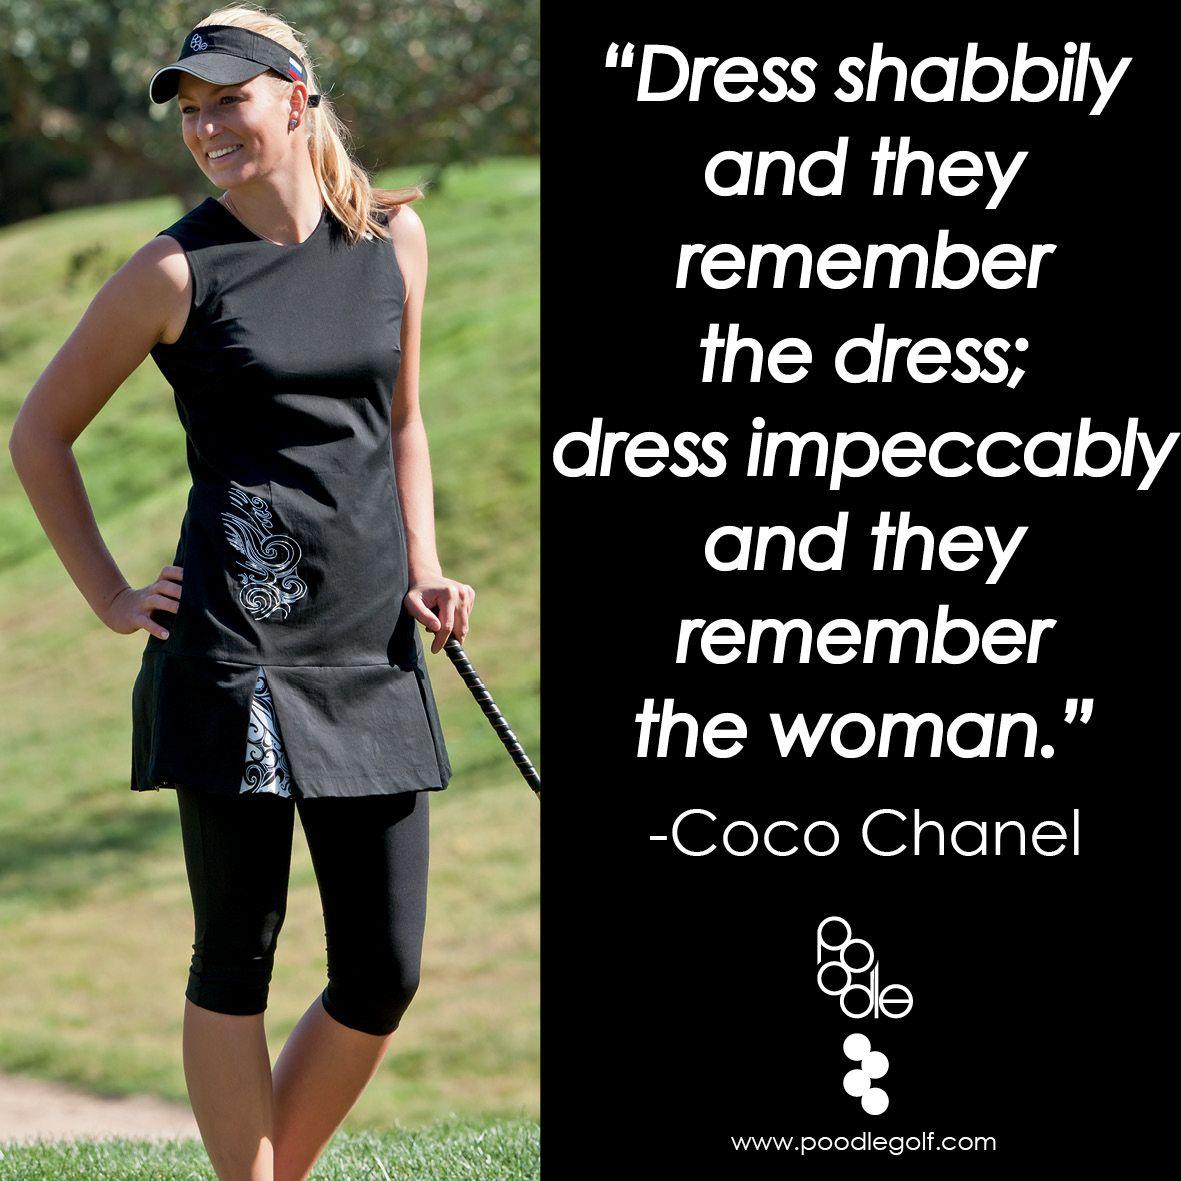 Little black dress black w scrolly black pleats golf quotes